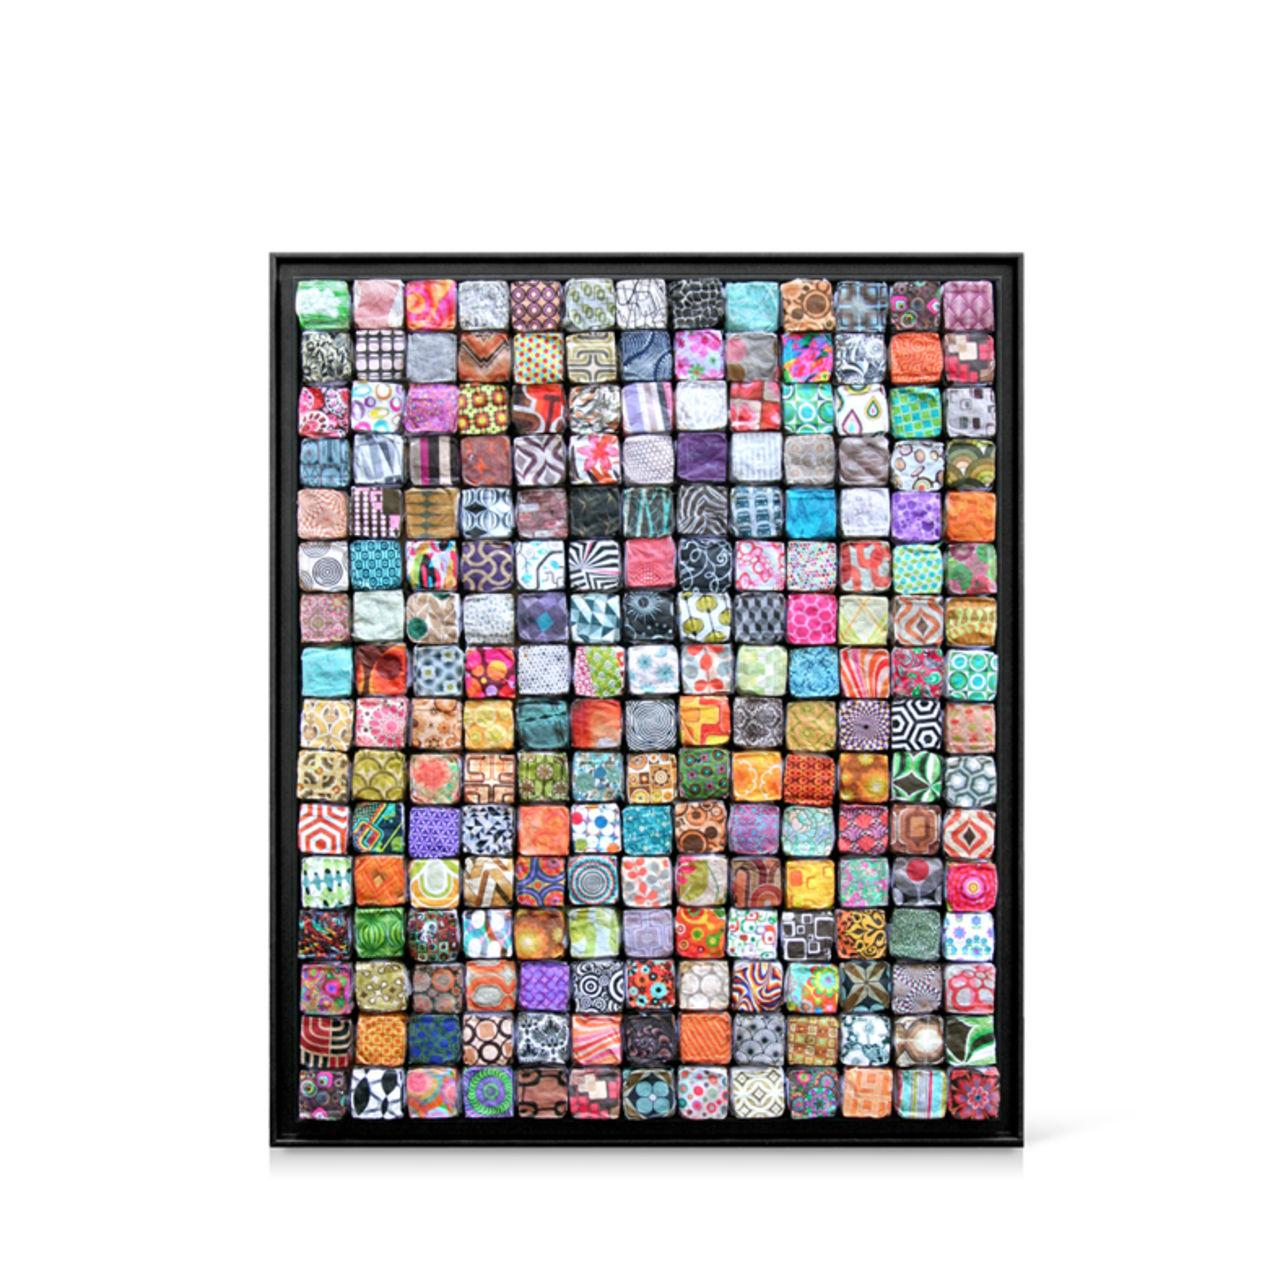 jean-michel buche 89 - Seventies 110x130